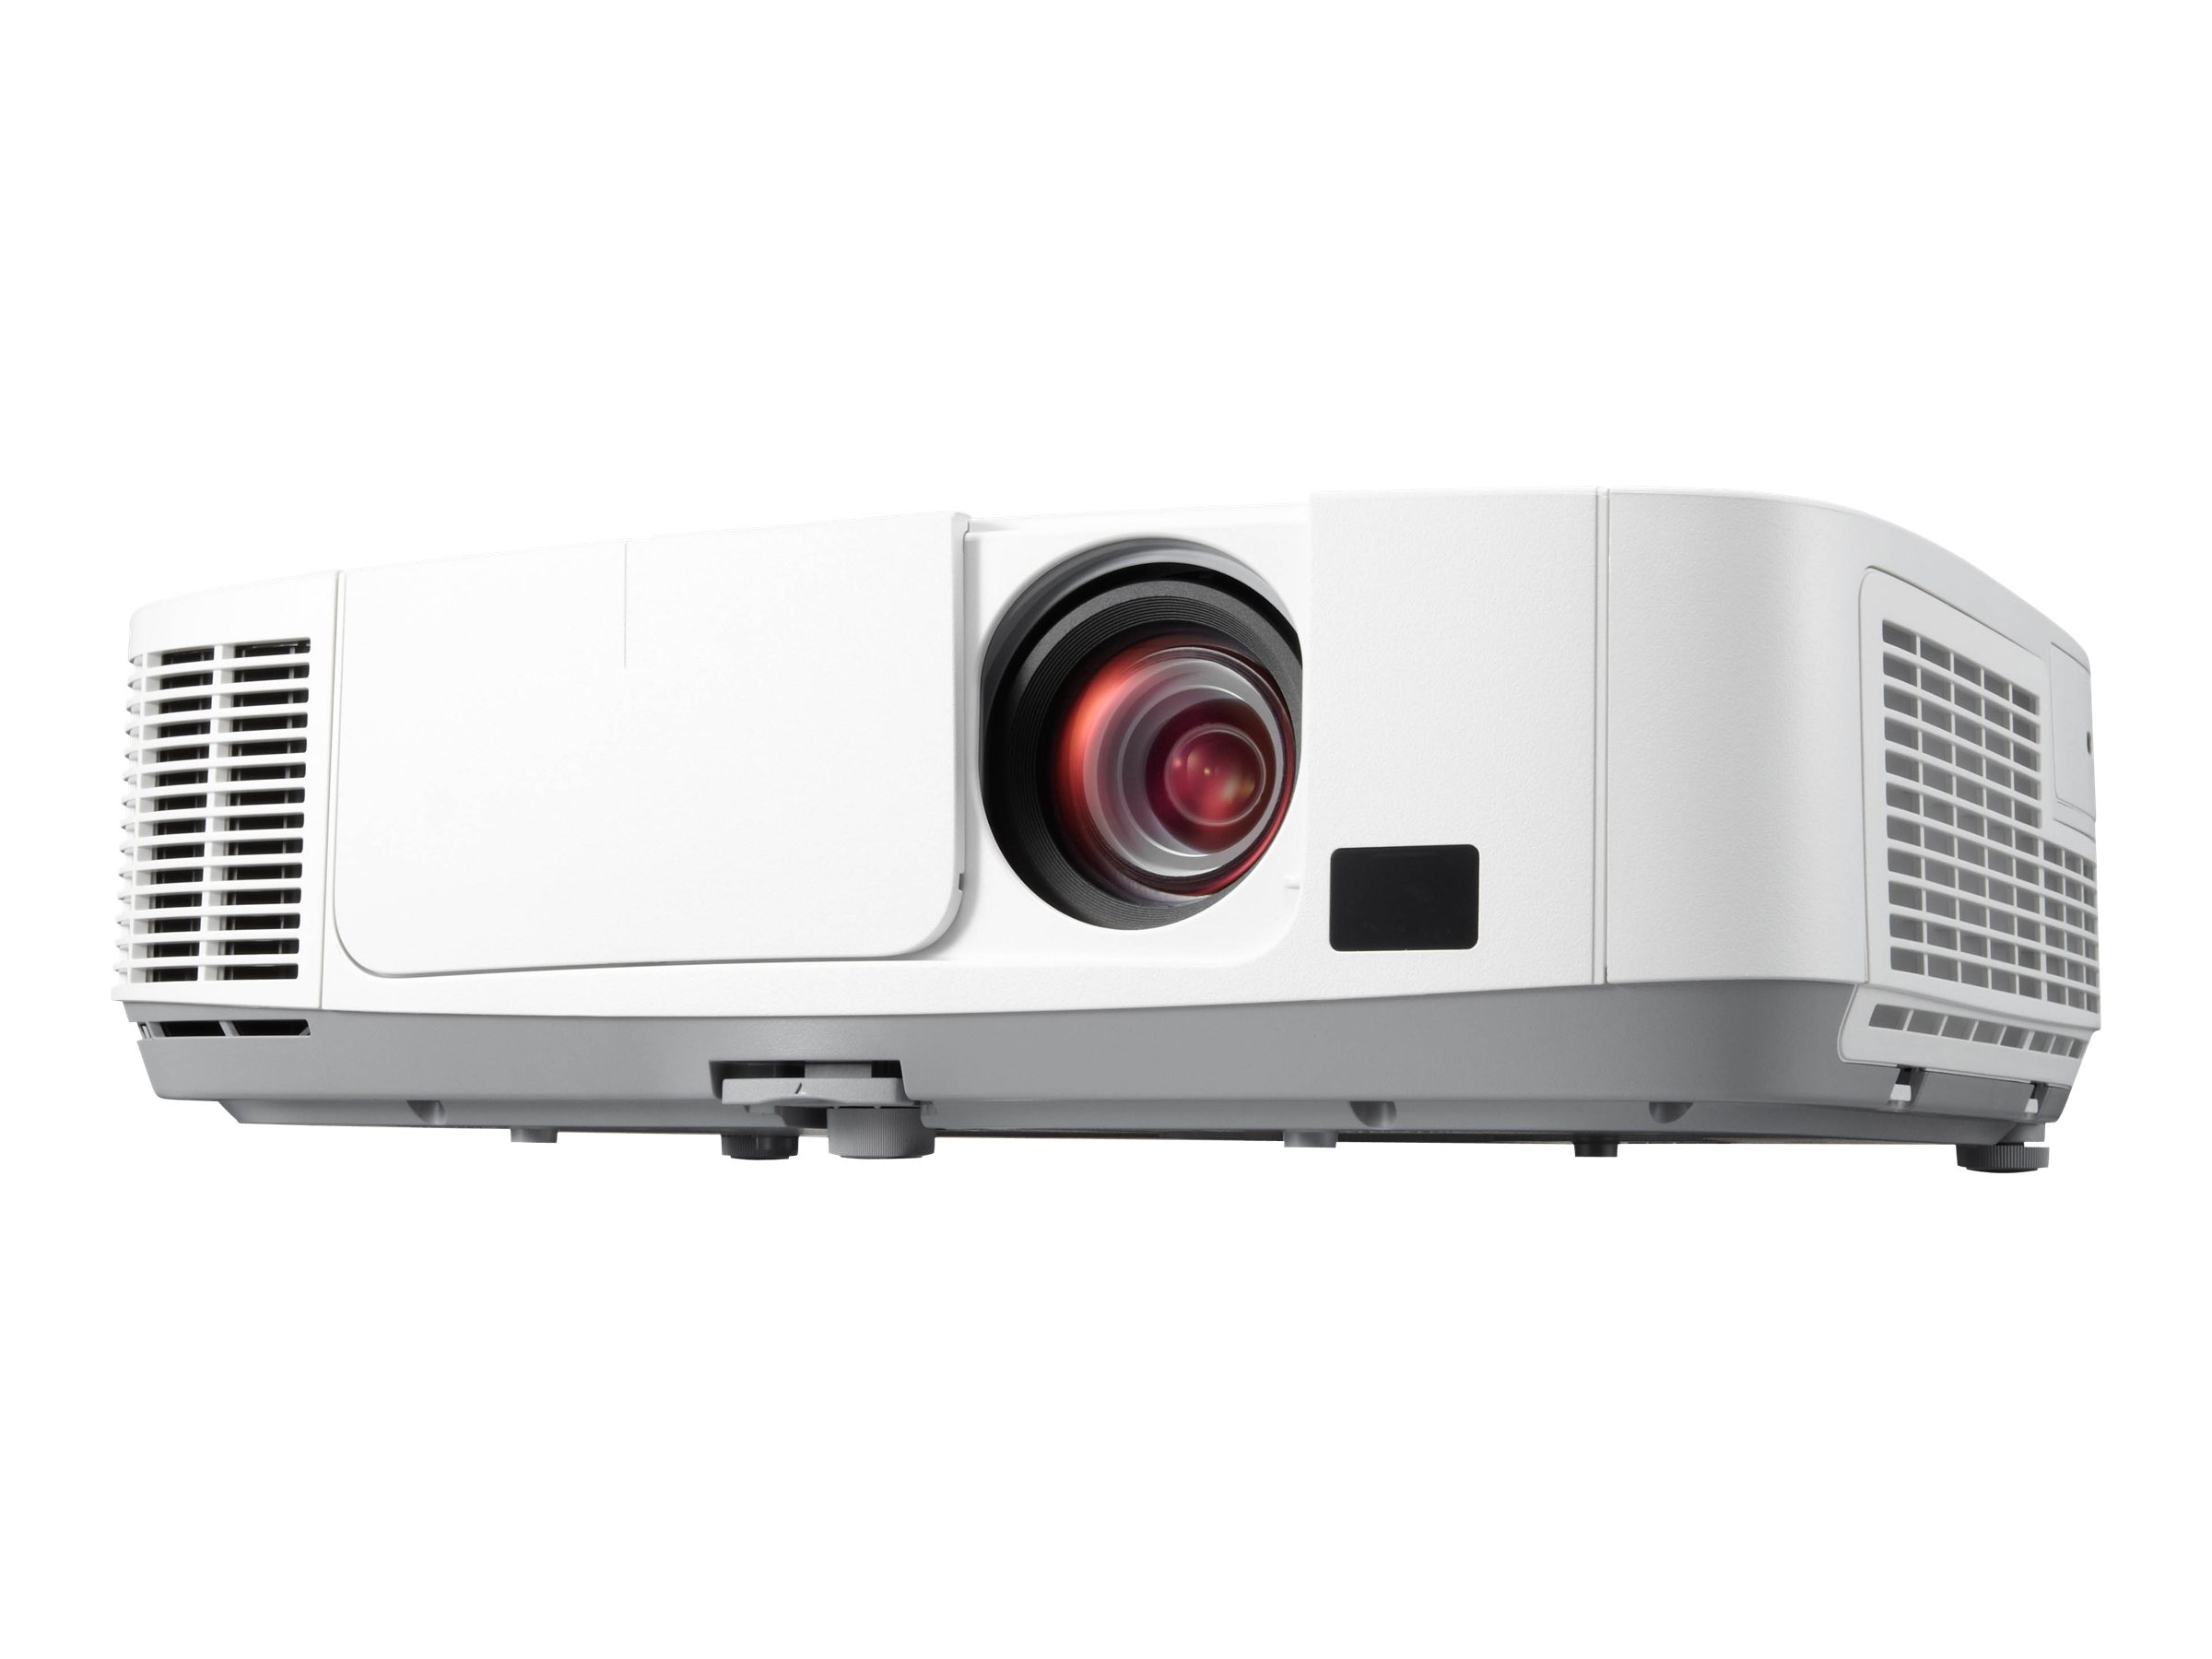 Open Box NEC NP-P501X XGA LCD Projector, 5000 Lumens, White